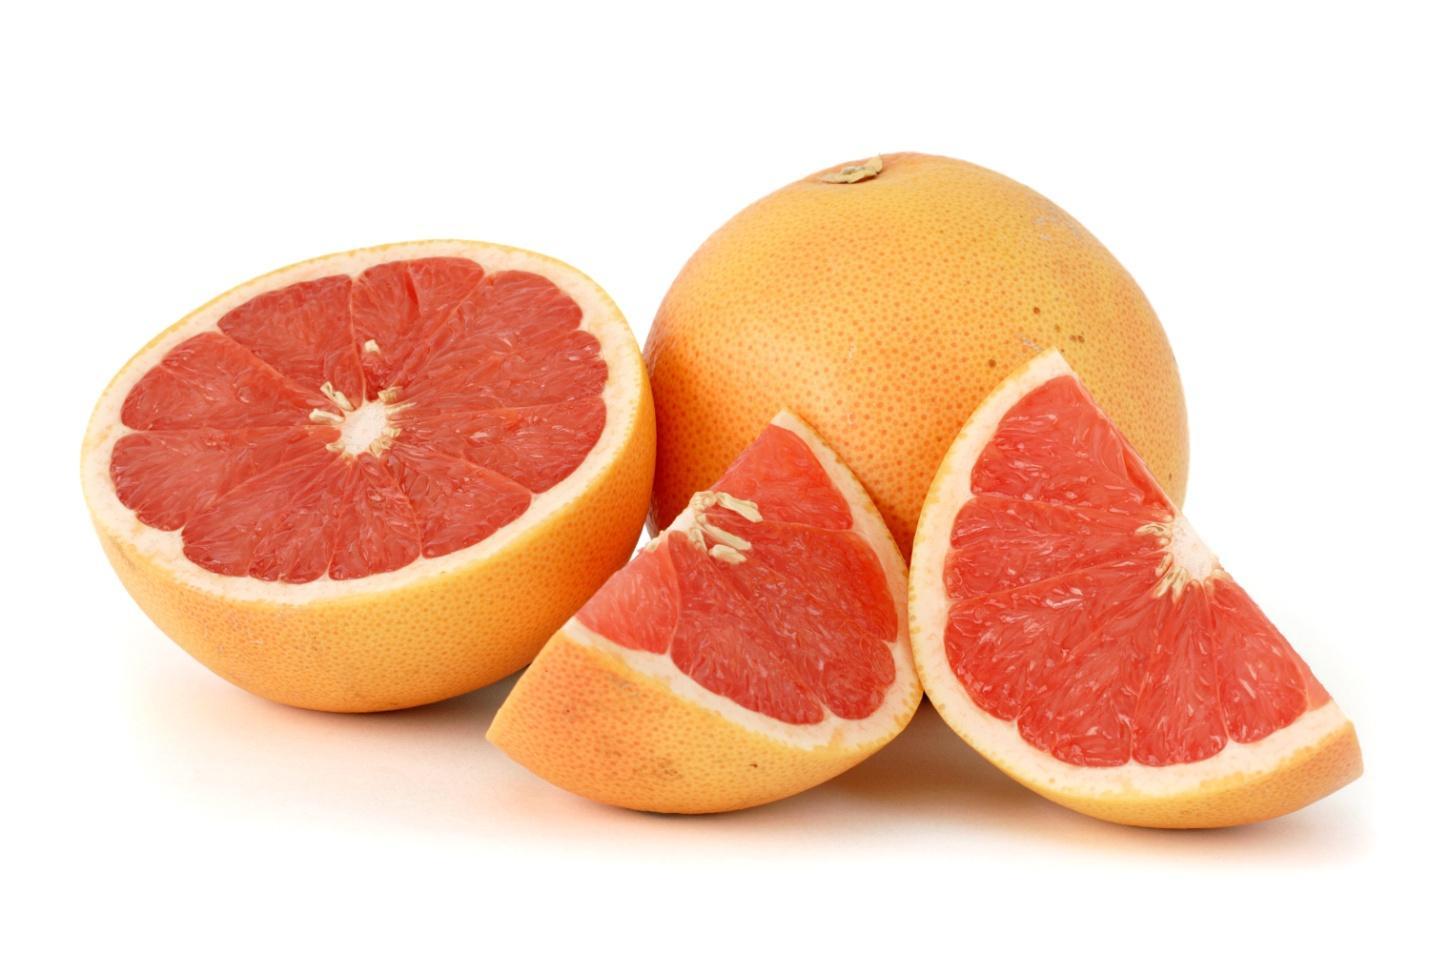 C:\Users\TOSHIBA\Desktop\Citrus_paradisi_(Grapefruit,_pink)_white_bg.jpg